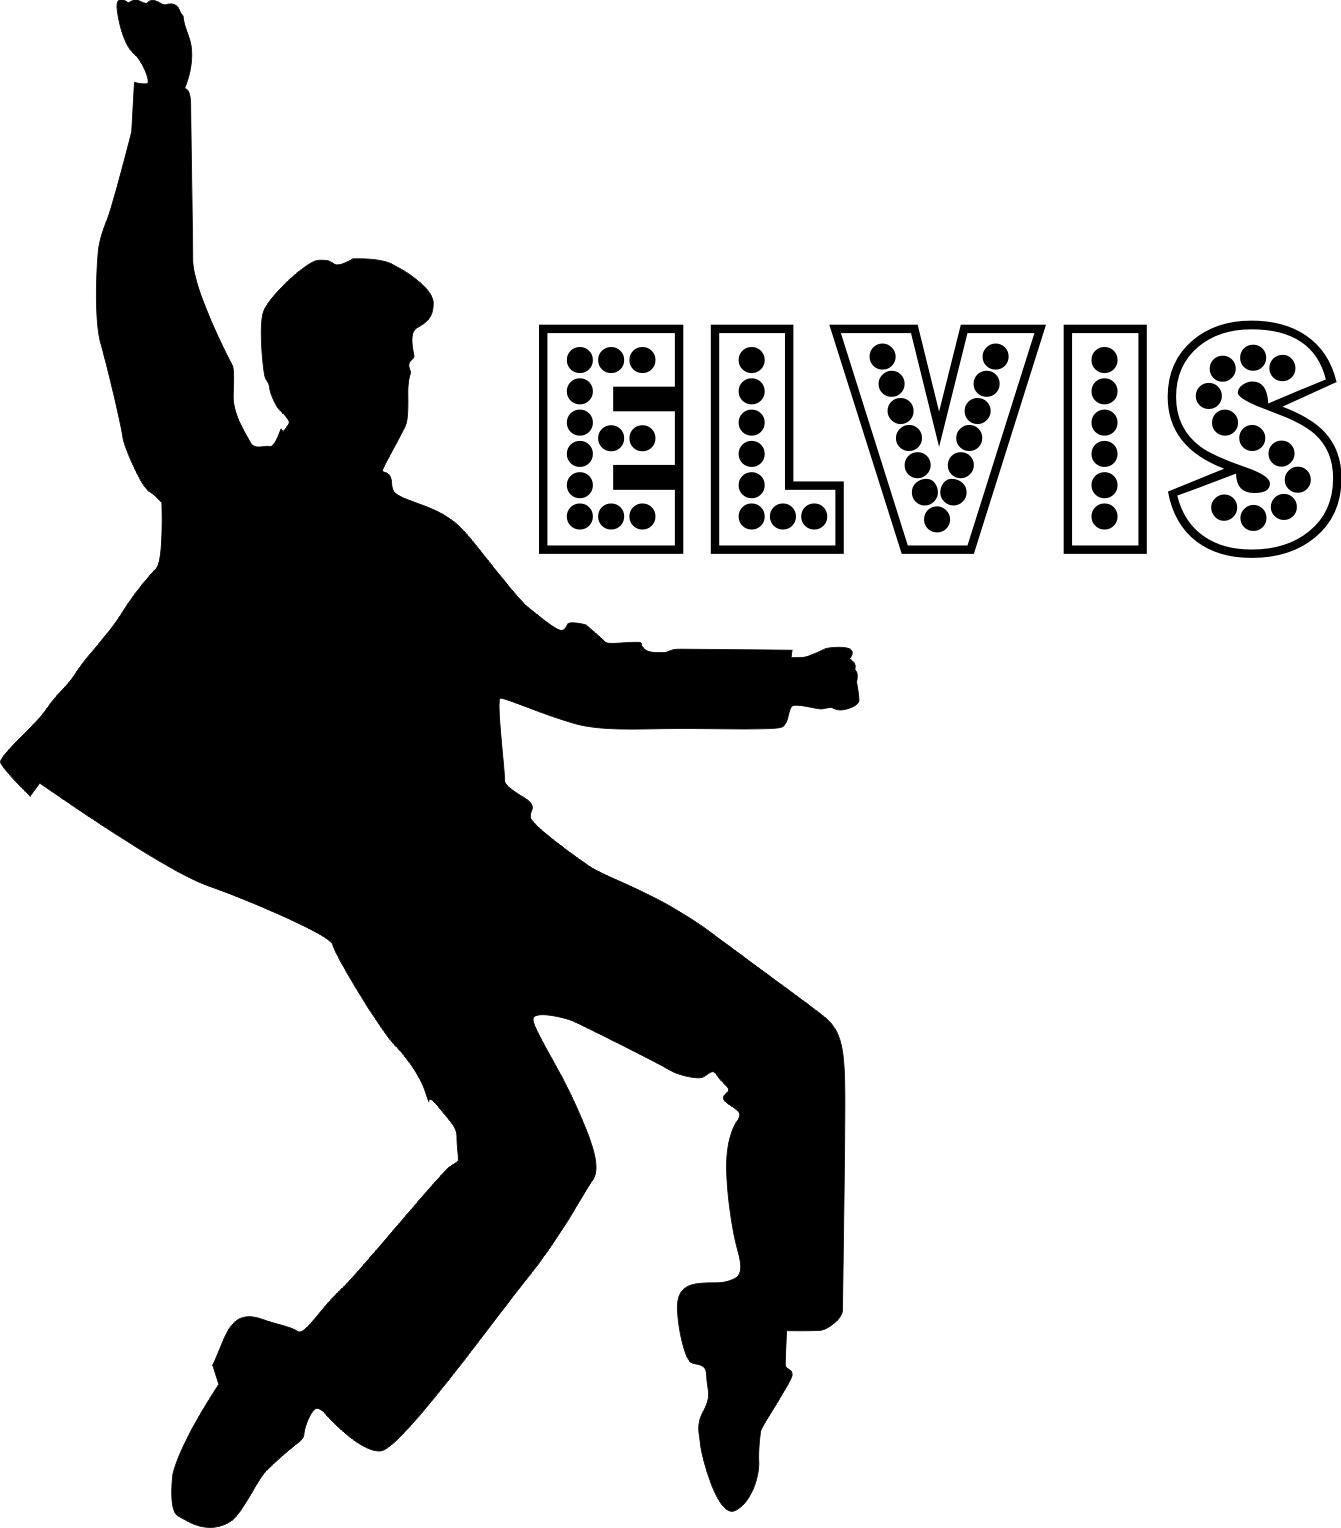 Elvis Presley clipart Elvis Jailhouse Rock Silhouette Presley white and presley Swiss